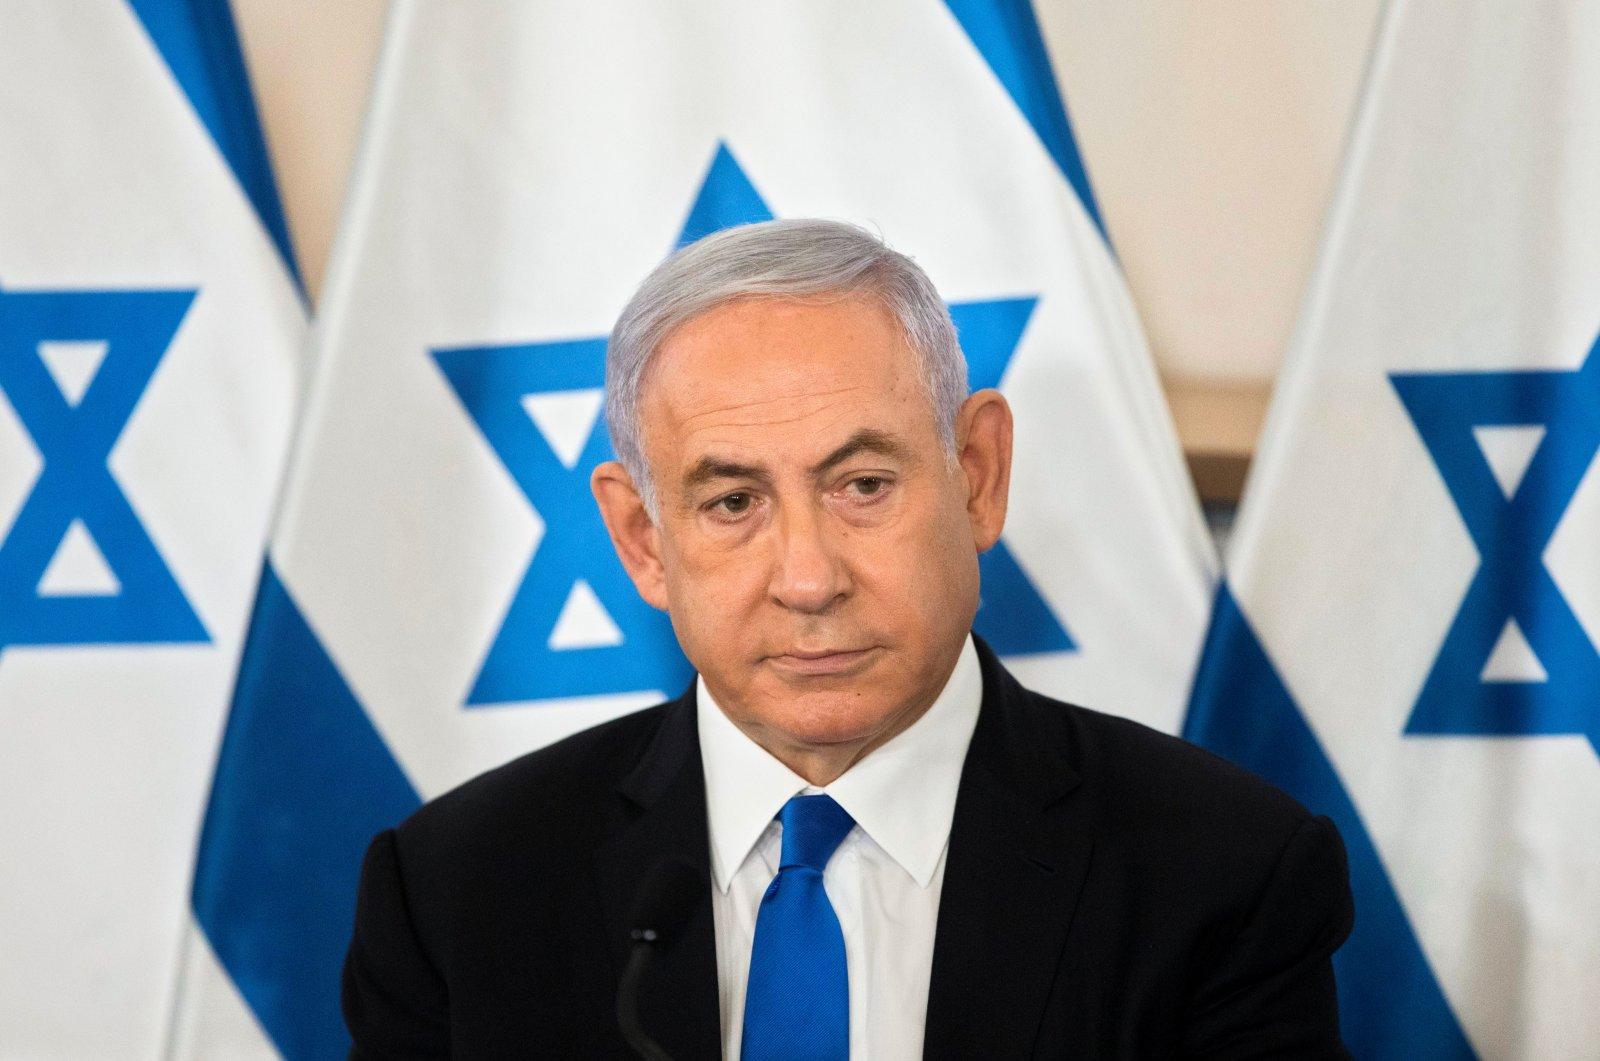 Israeli Prime Minister Benjamin Netanyahu looks on during a briefing to ambassadors to Israel at a military base in Tel Aviv, Israel, May 19, 2021. (Sebastian Scheiner / Pool via Reuters)